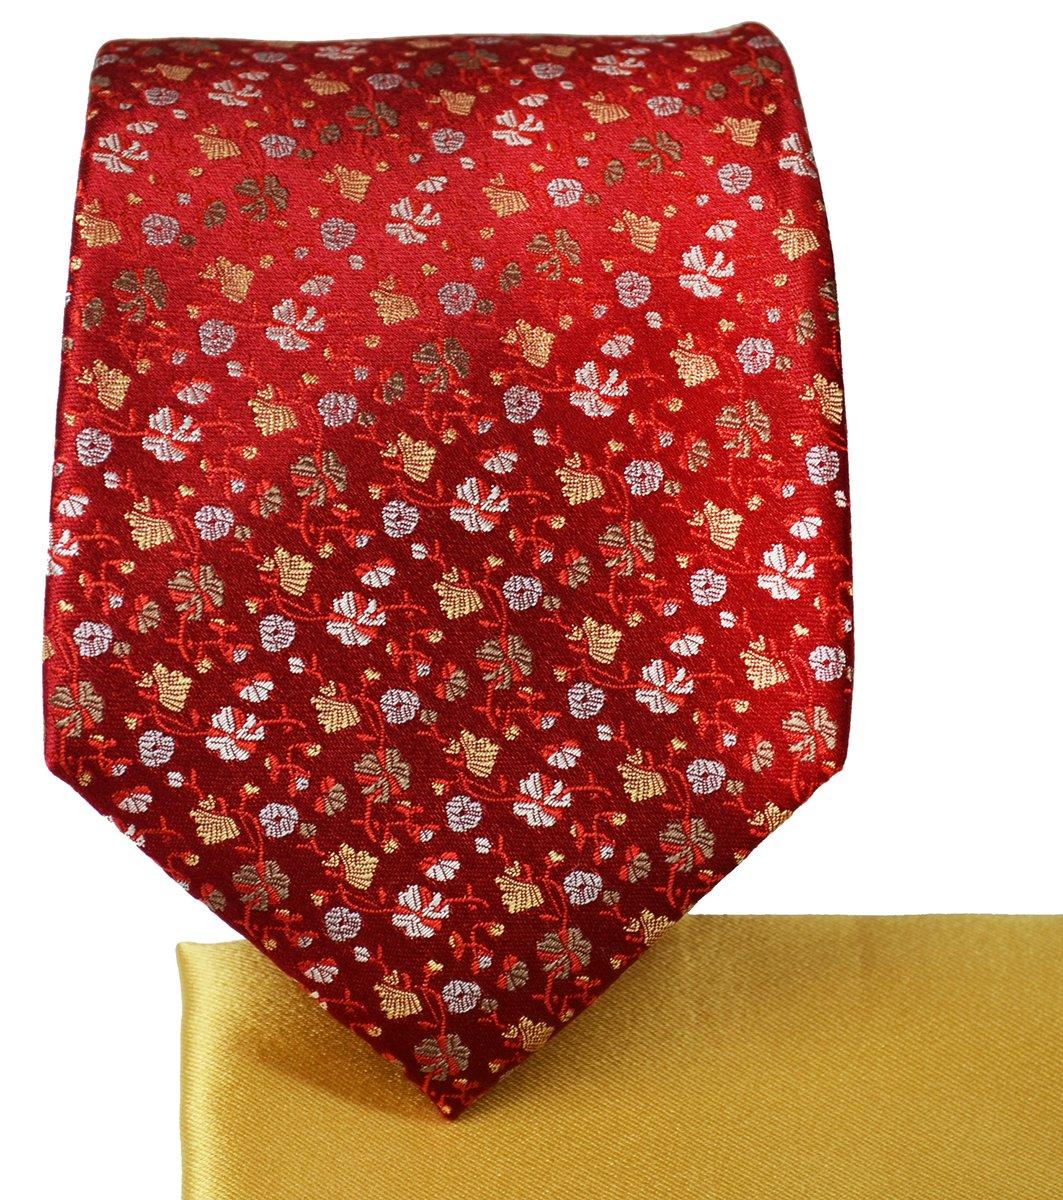 Mood Indigo and Violet 7-fold Silk Tie and Pocket Square